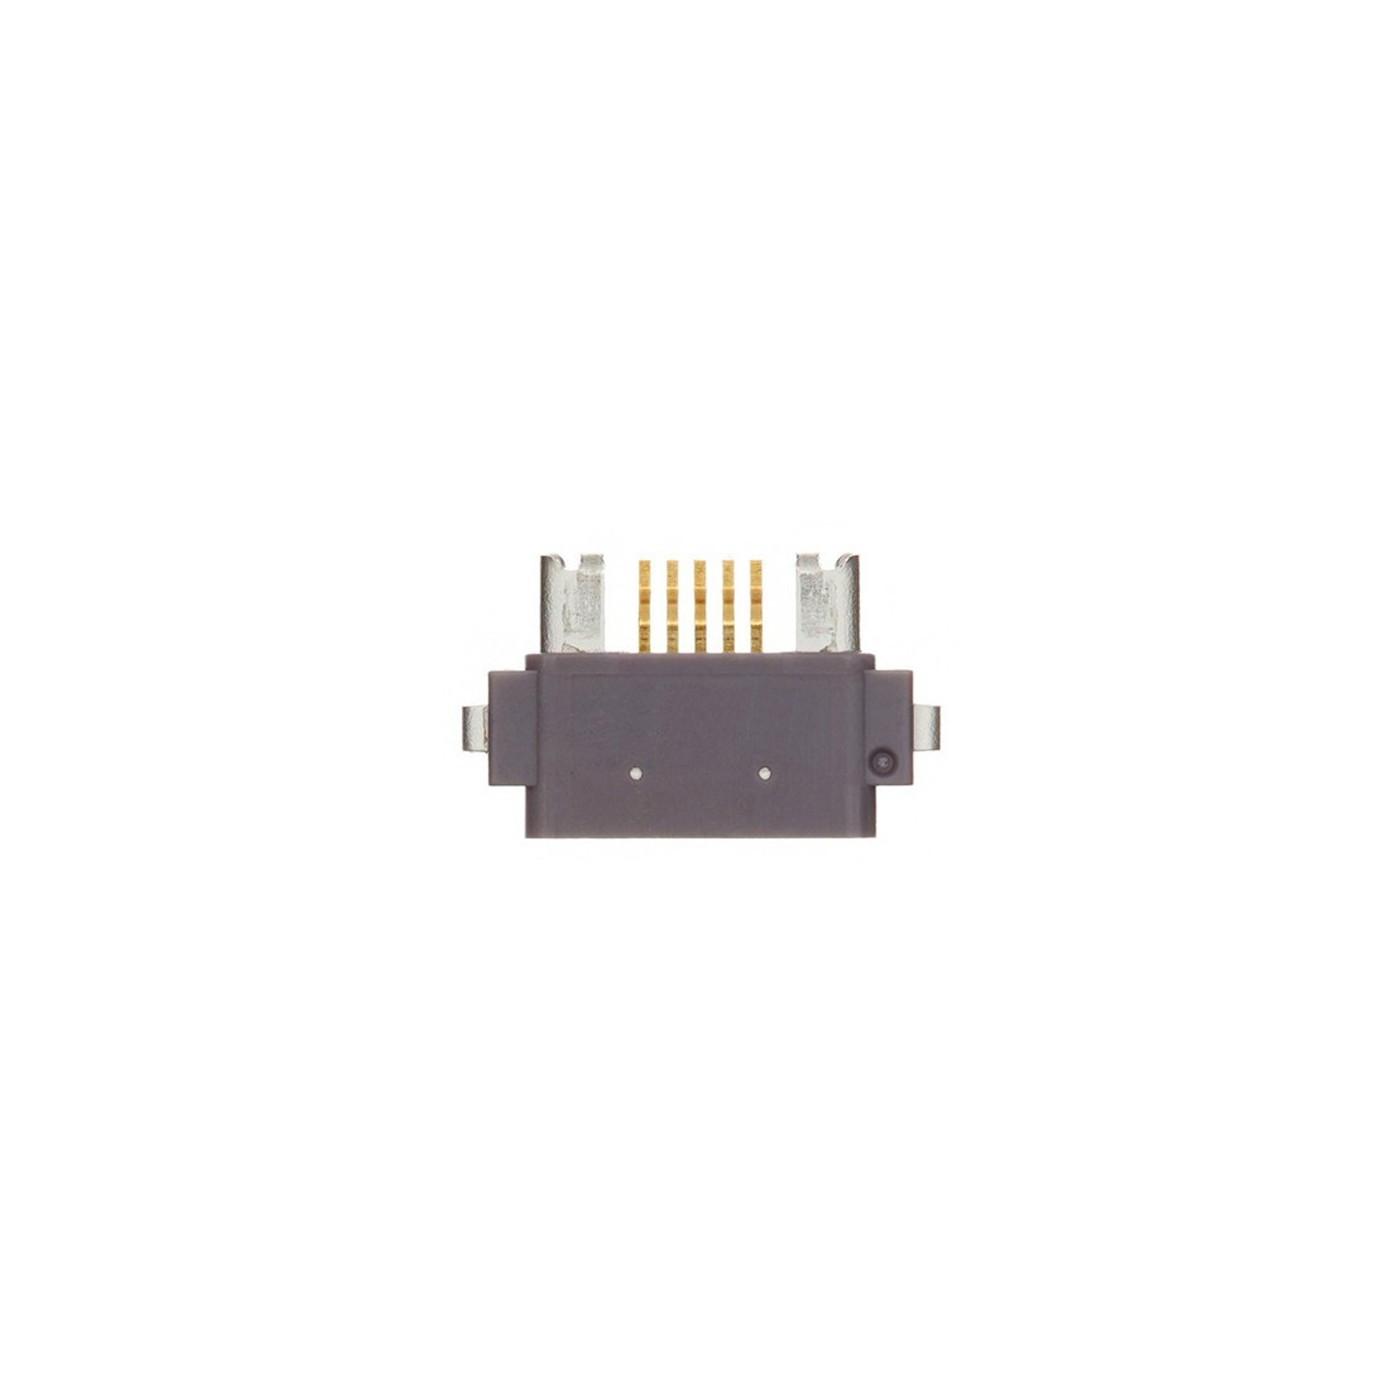 Charging connector Sony Xperia Z L36h C6602 C6603 LT36 L36 dock loads data